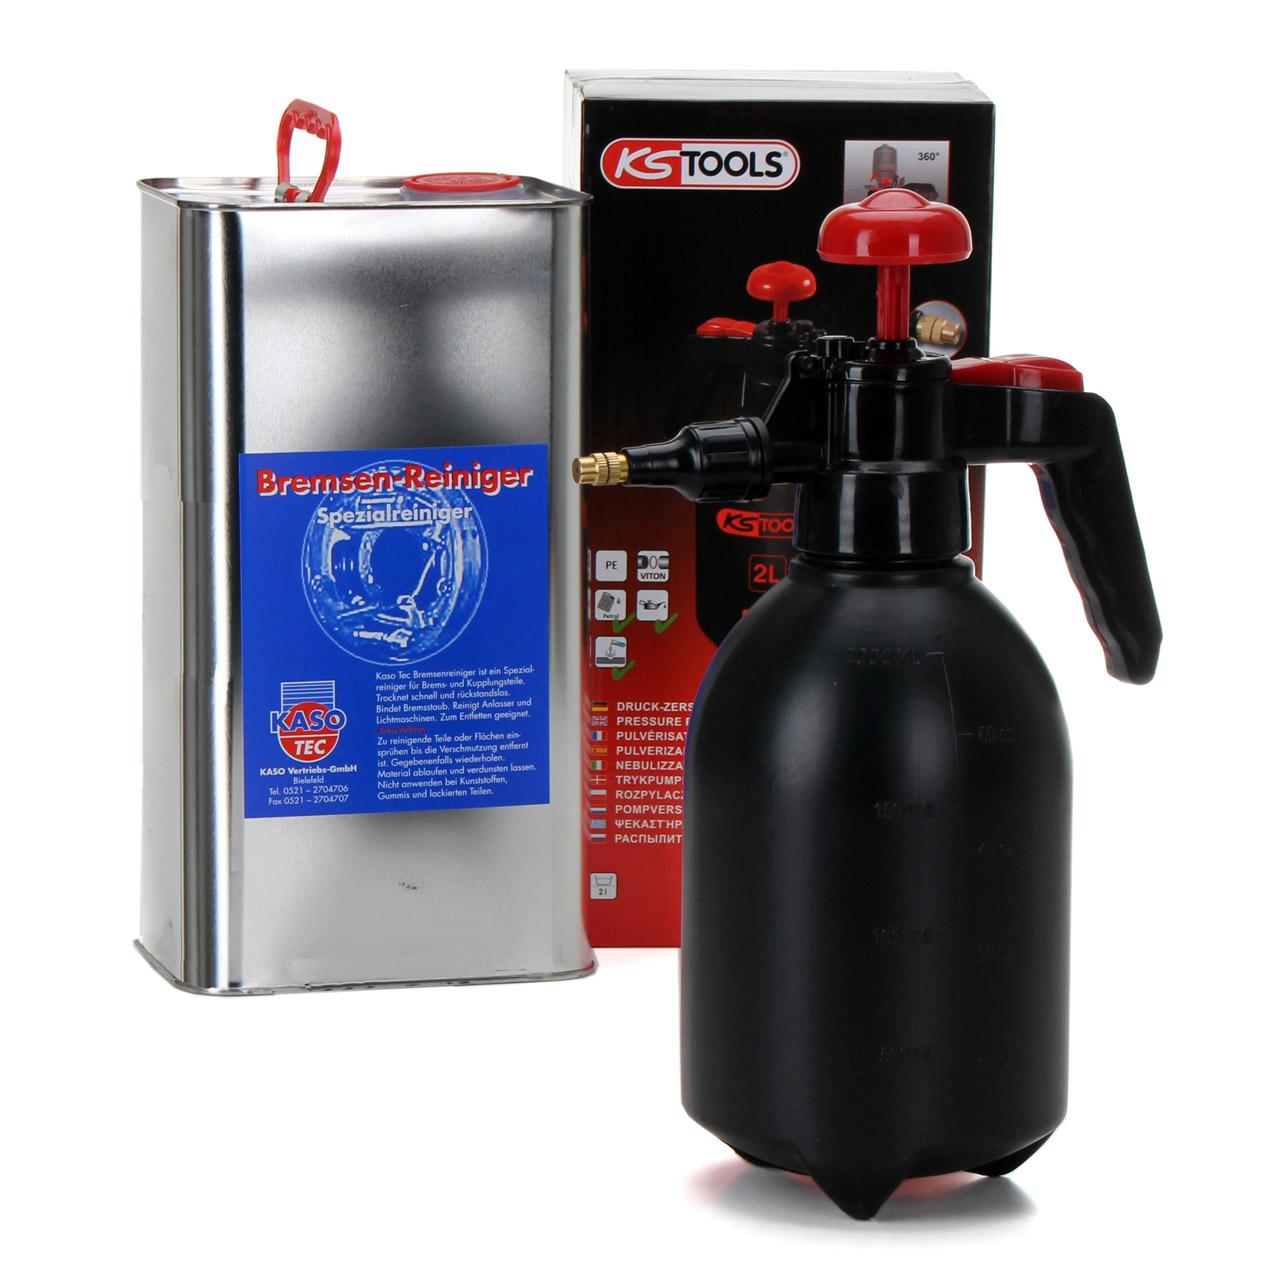 KASOTEC Bremsenreiniger Montagereiniger 5 L + KS TOOLS Druckpumpflasche 2 LITER